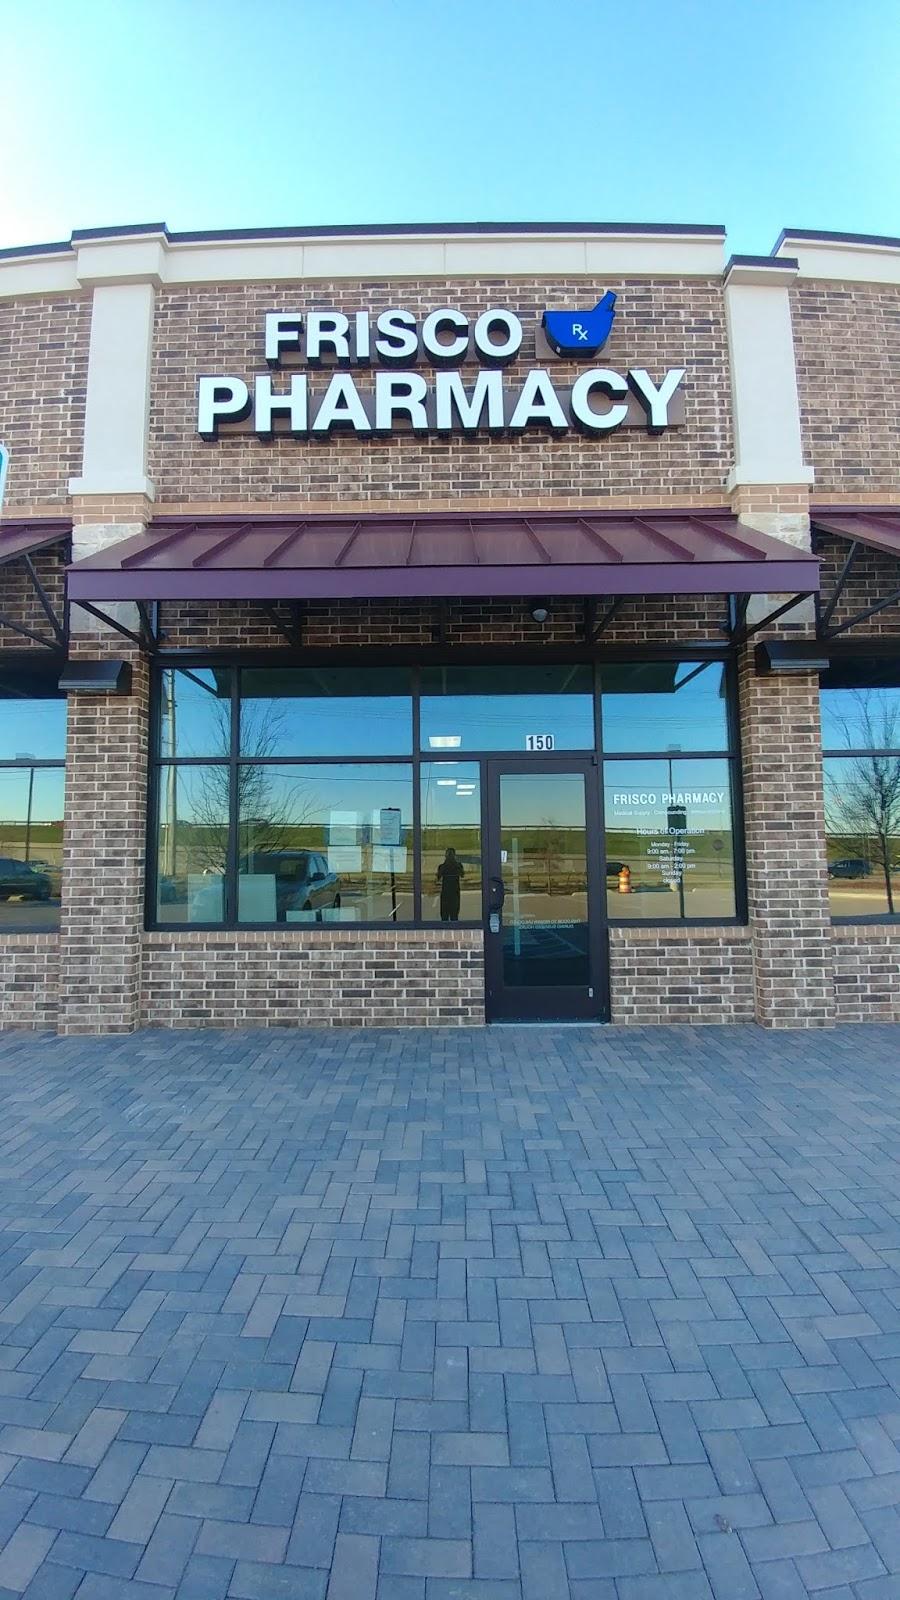 Frisco Pharmacy - pharmacy  | Photo 7 of 10 | Address: 14550 TX-121 STE 150, Frisco, TX 75035, USA | Phone: (469) 305-7058